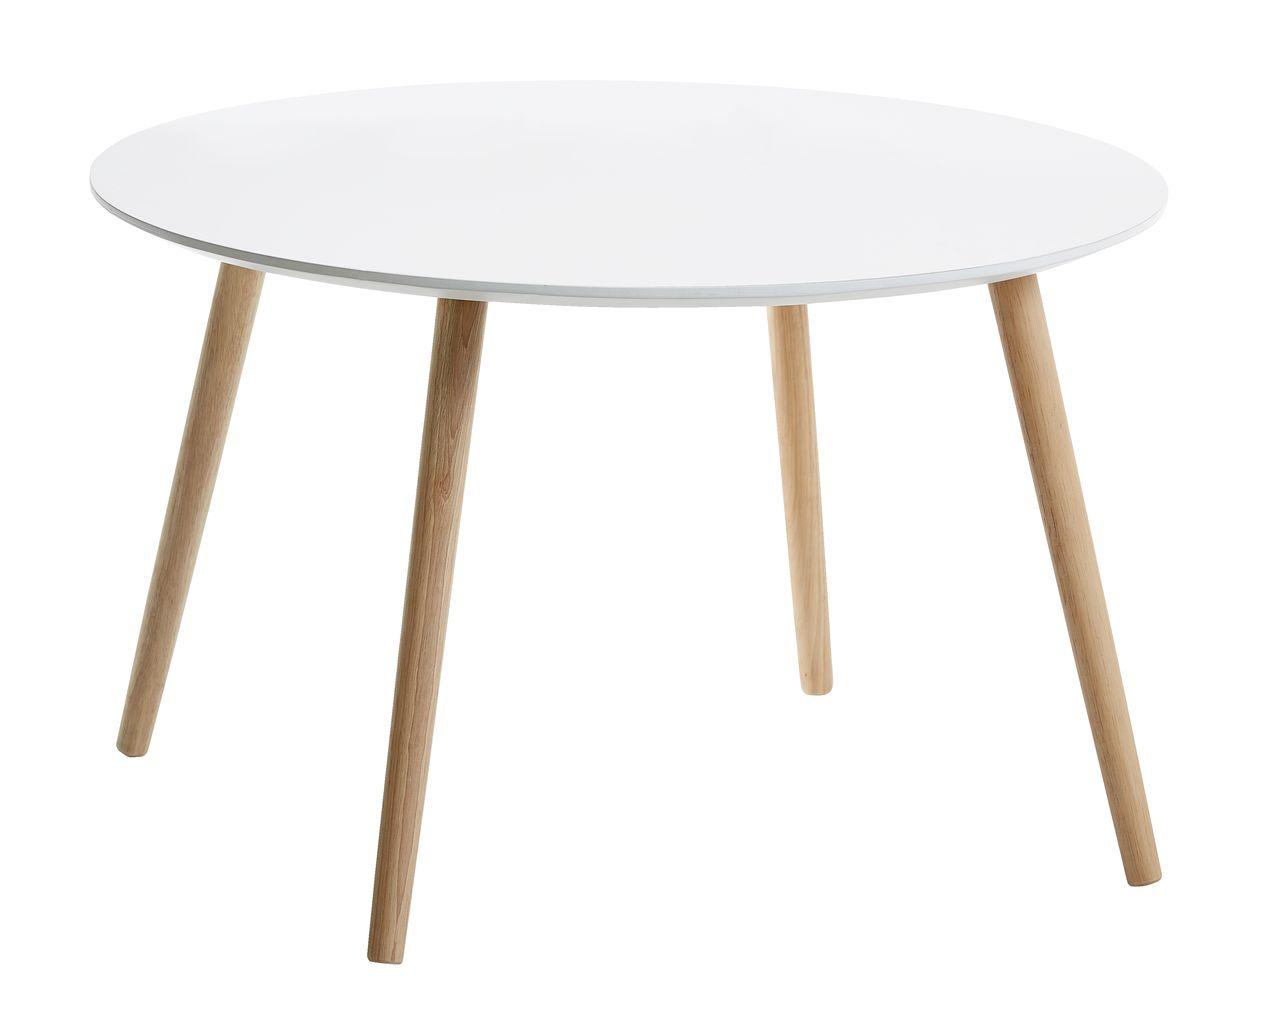 sofabord jysk Sofabord GALTEN Ø75 hvid | JYSK sofabord jysk